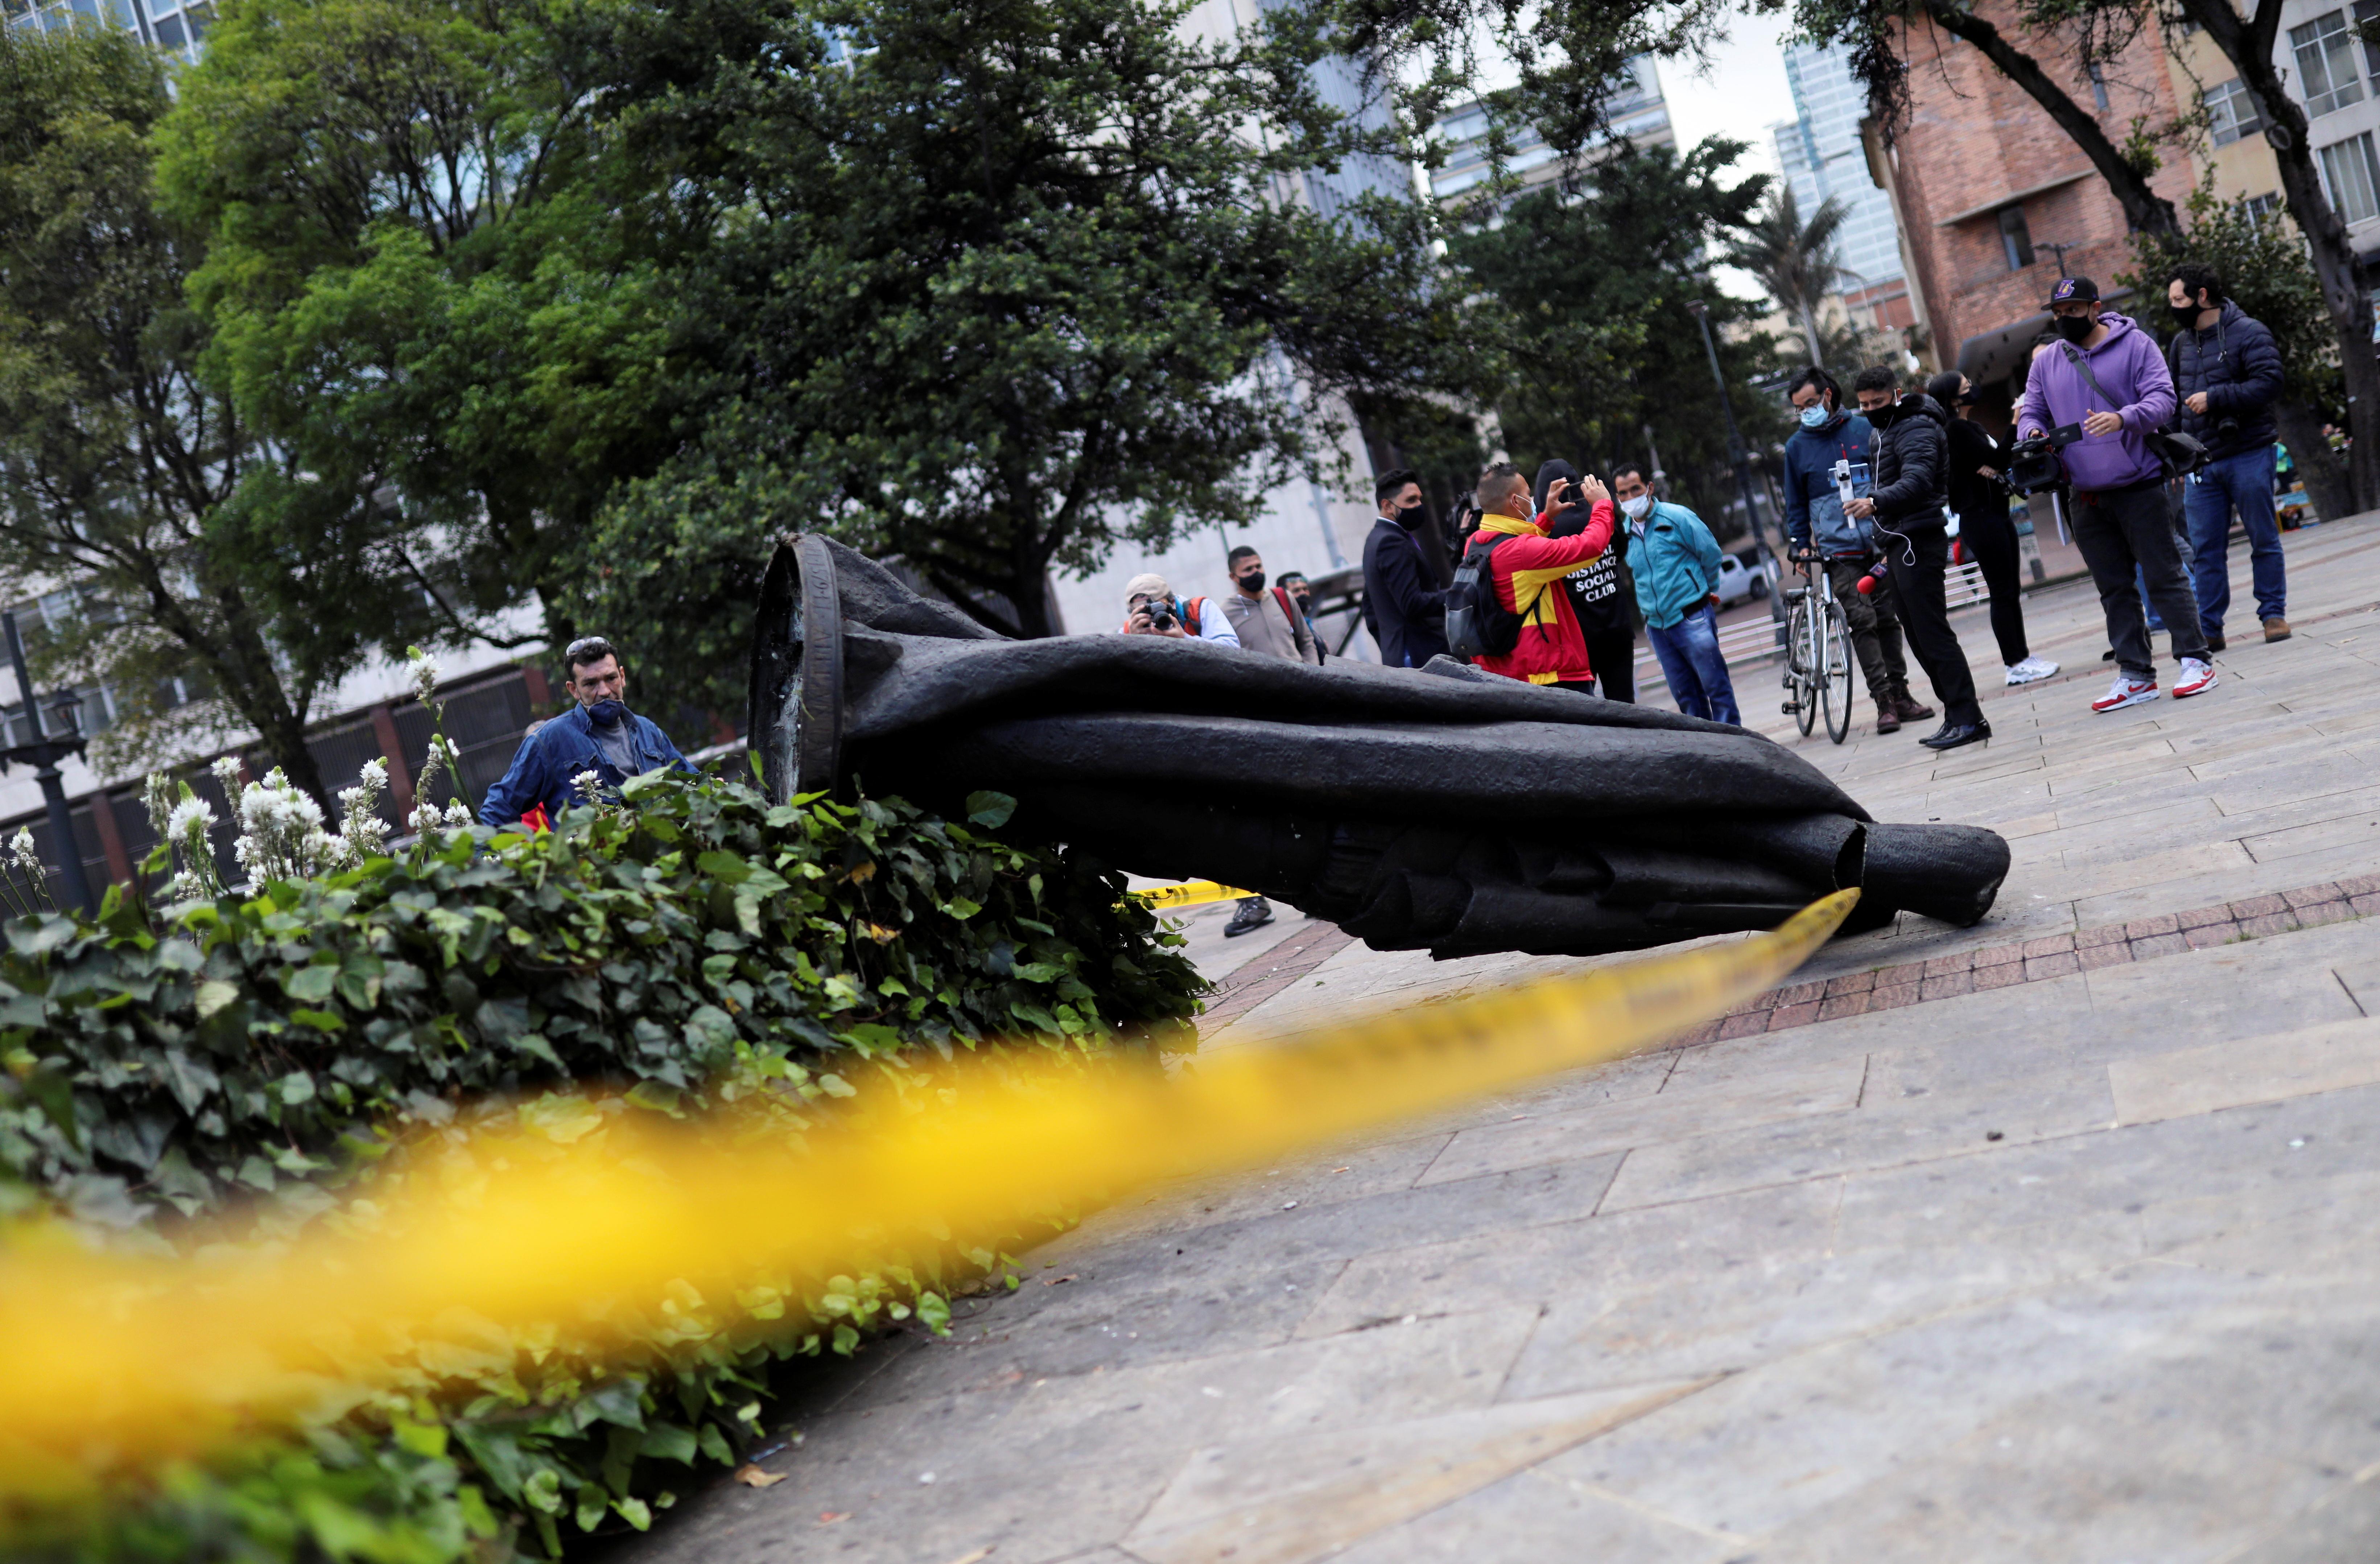 Statue of Spanish conqueror Gonzalo Jimenez de Quesada is demolished by Indigenous Misak in Bogota, Colombia May 7, 2021. REUTERS/Luisa Gonzalez